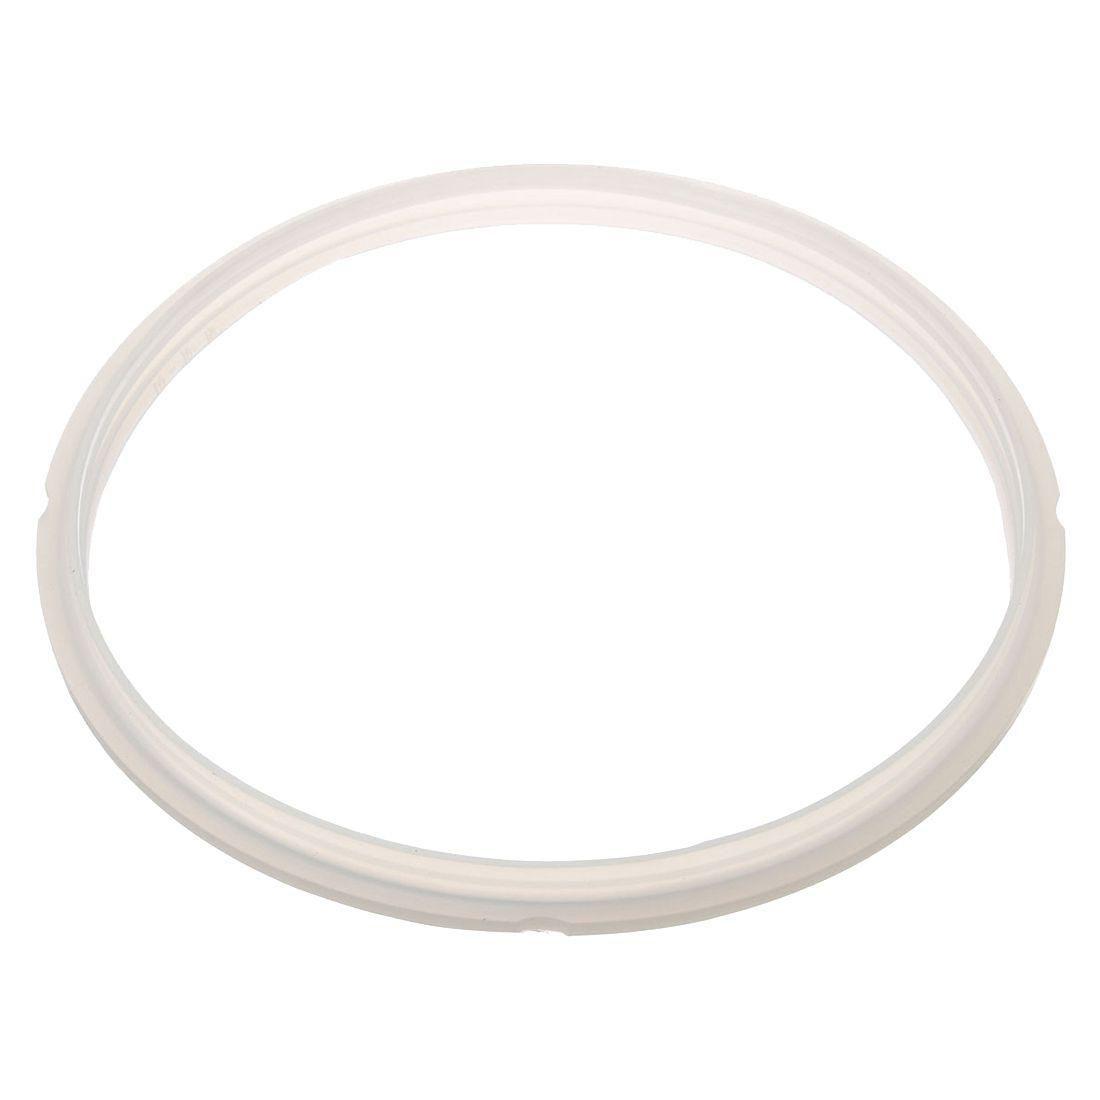 gasket 20cm 6068809990 WMF Pressure Cooker Sealing Ring